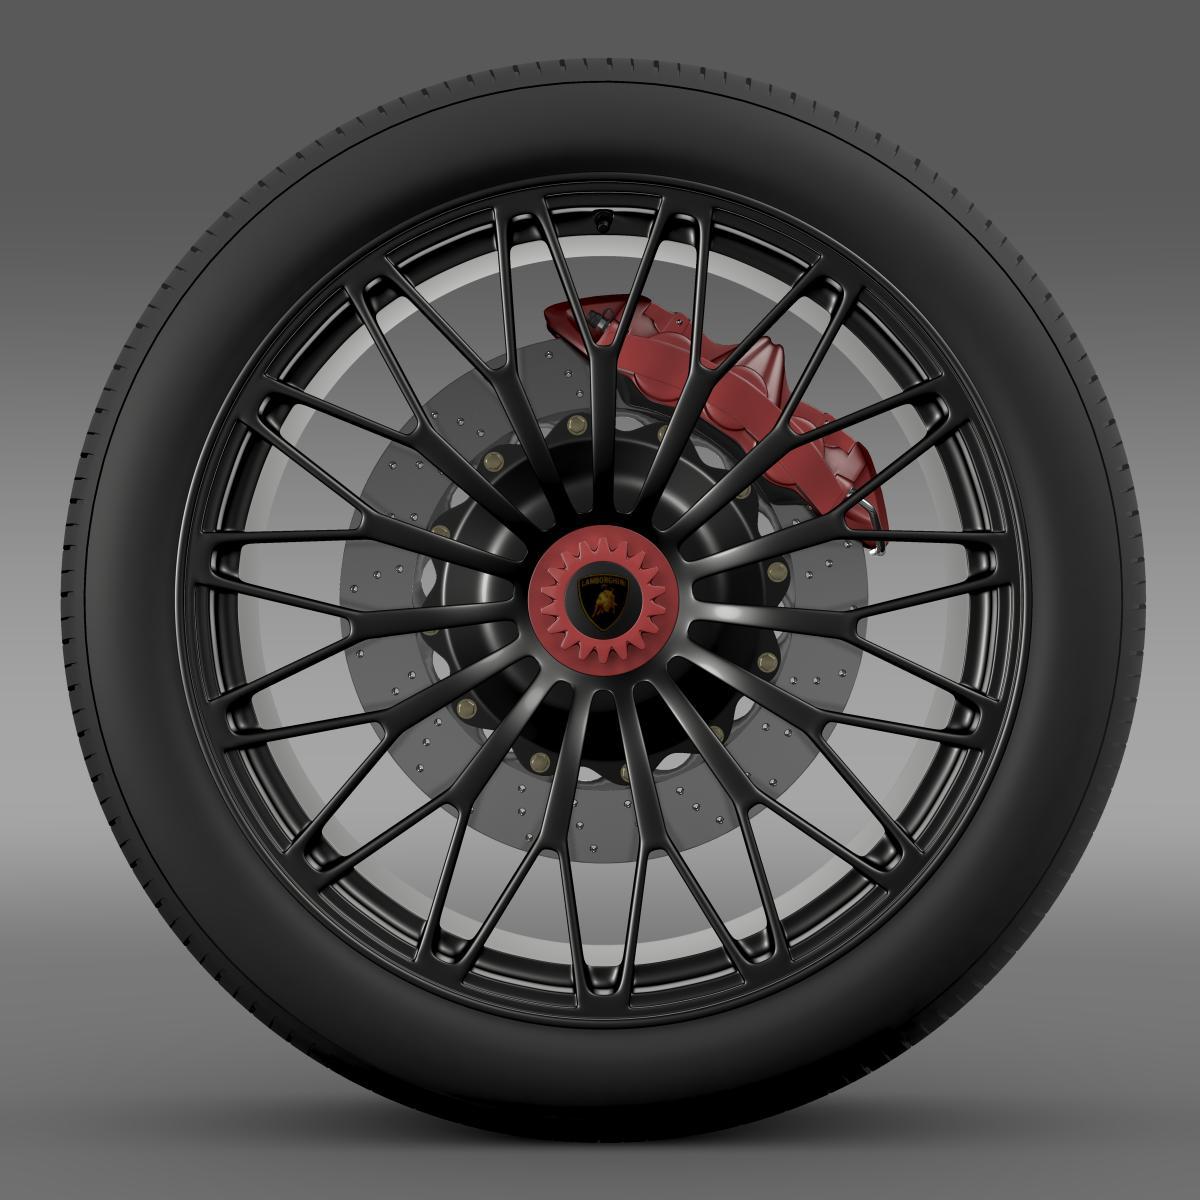 lamborghini aventador lp 750 4 sv wheel 3d model 3ds max fbx c4d lwo ma mb hrc xsi obj 210713